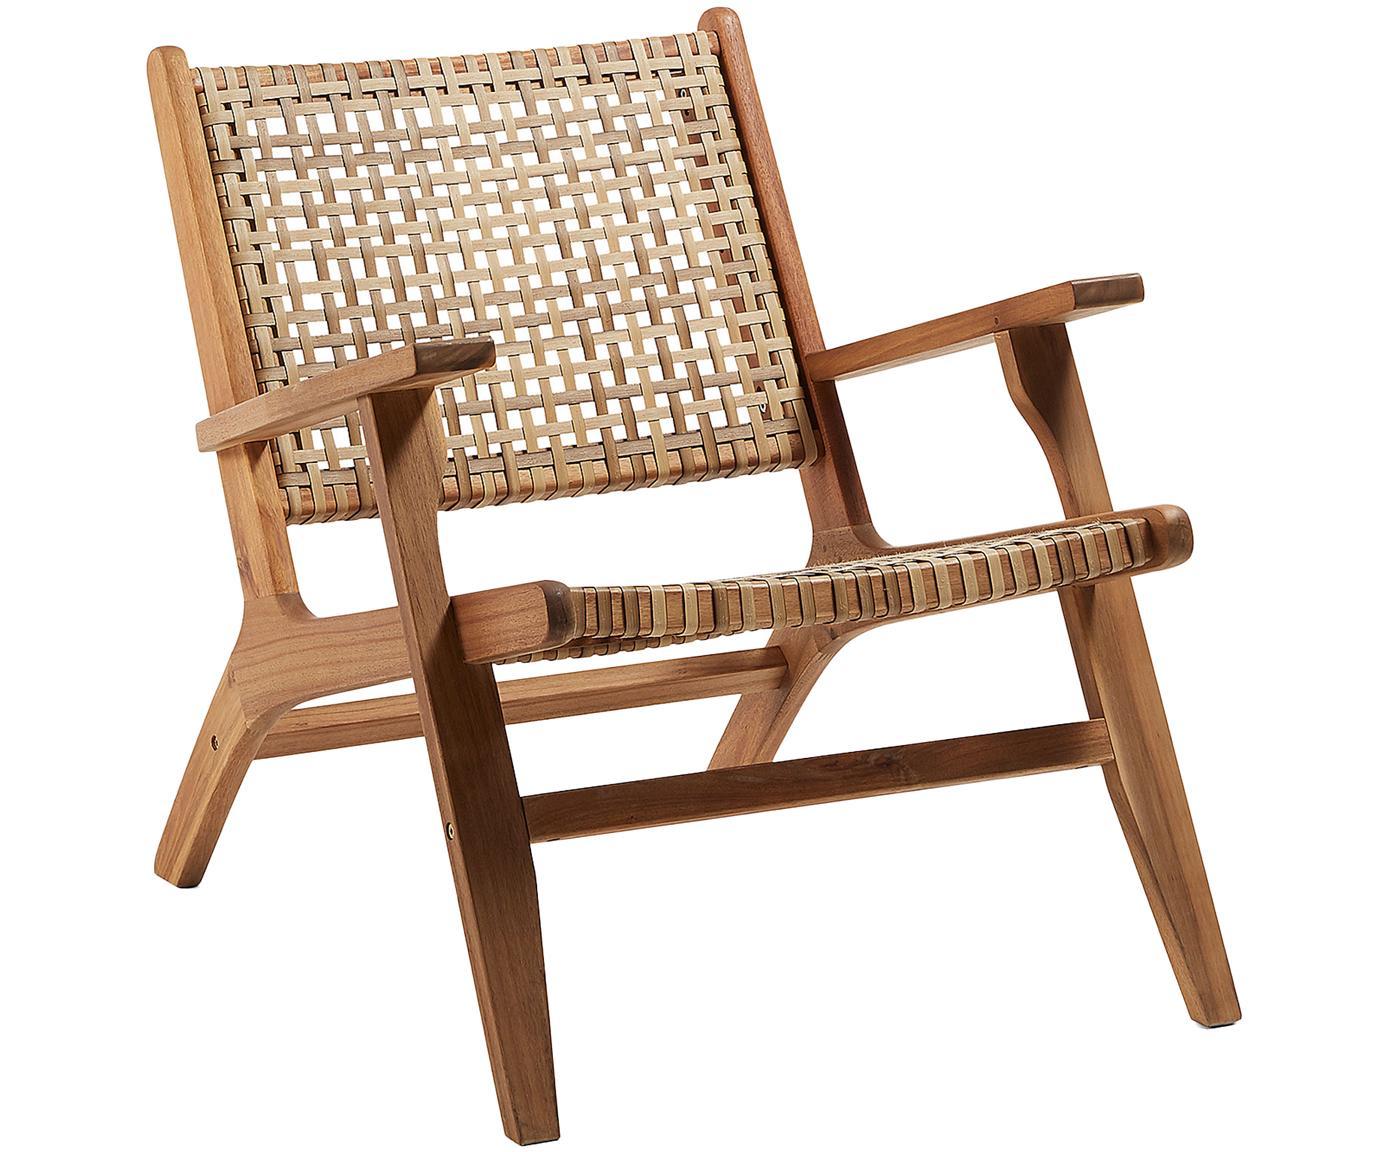 Sedia a poltrona intrecciata Grignoon, Struttura: legno d'acacia massiccio, Legno d'acacia, beige, Larg. 68 x Prof. 80 cm